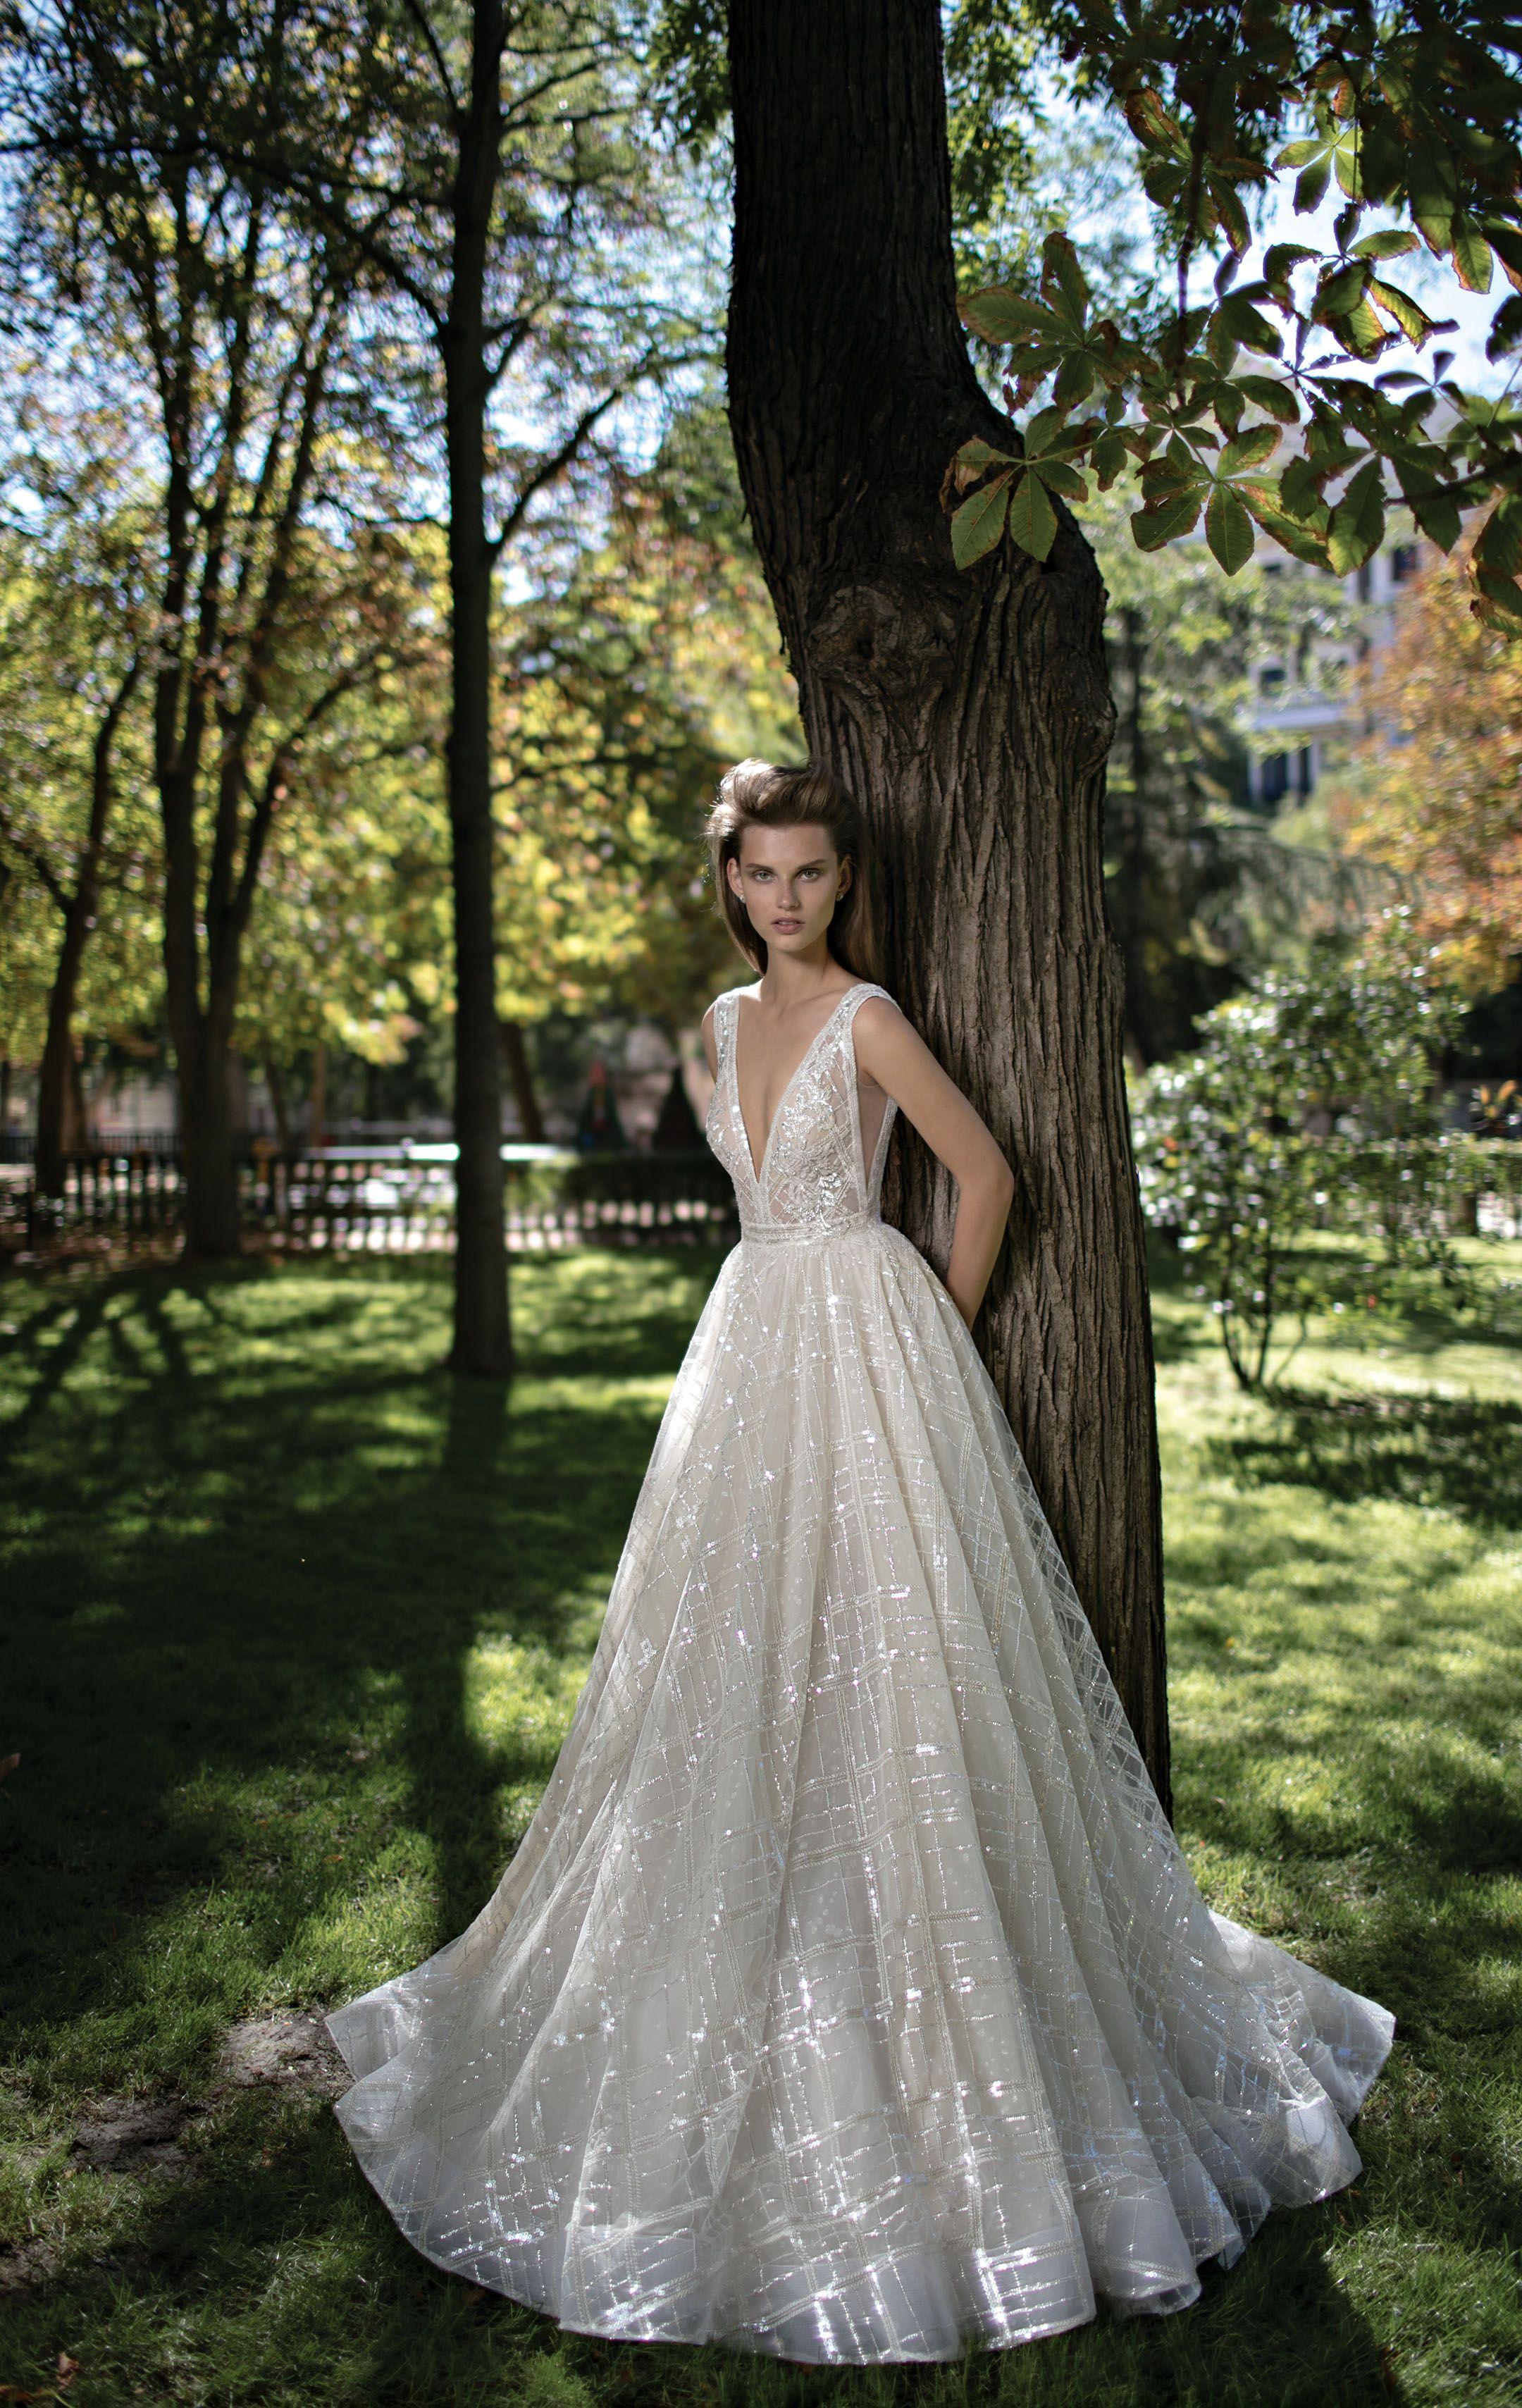 Berta Fall 2016 Bridal Gorgeous Pretty A Line Wedding Ball Gown Dress Sleeveless Deep V Plunging Neckline